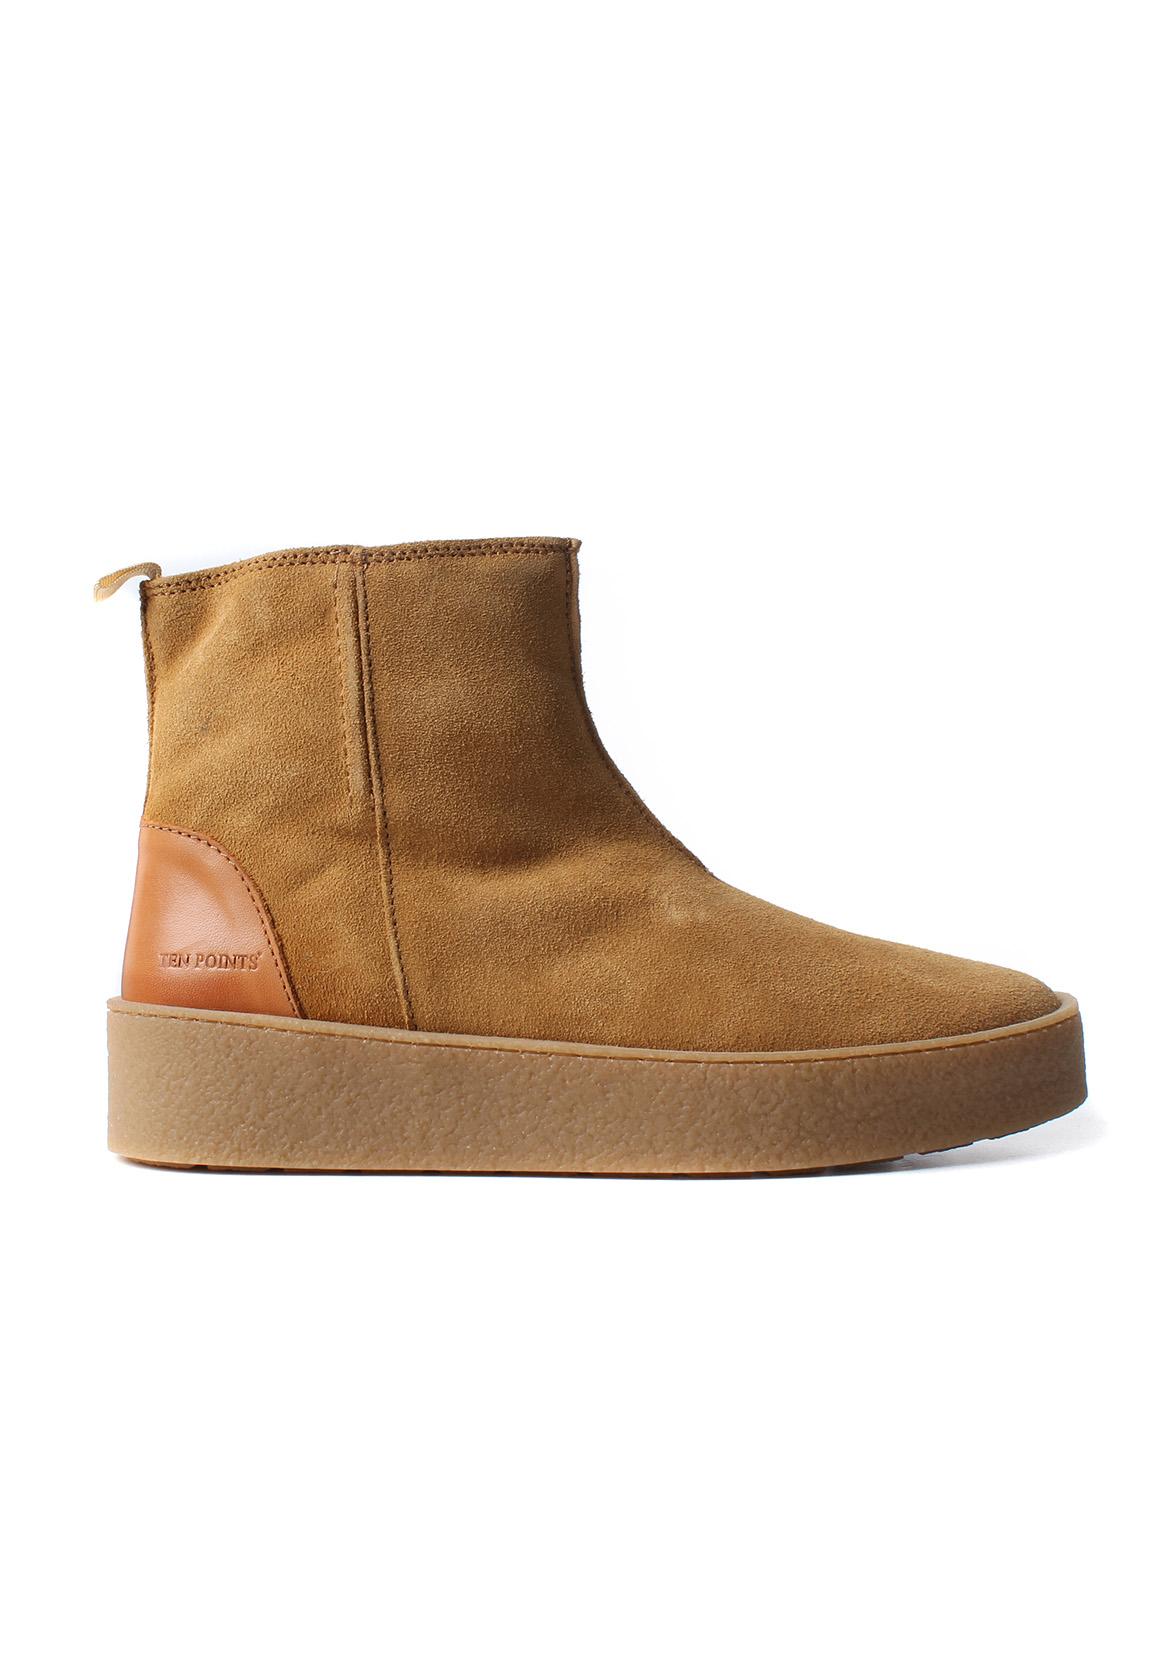 ten points chelsea boots women johanna 266001 beige cognac. Black Bedroom Furniture Sets. Home Design Ideas